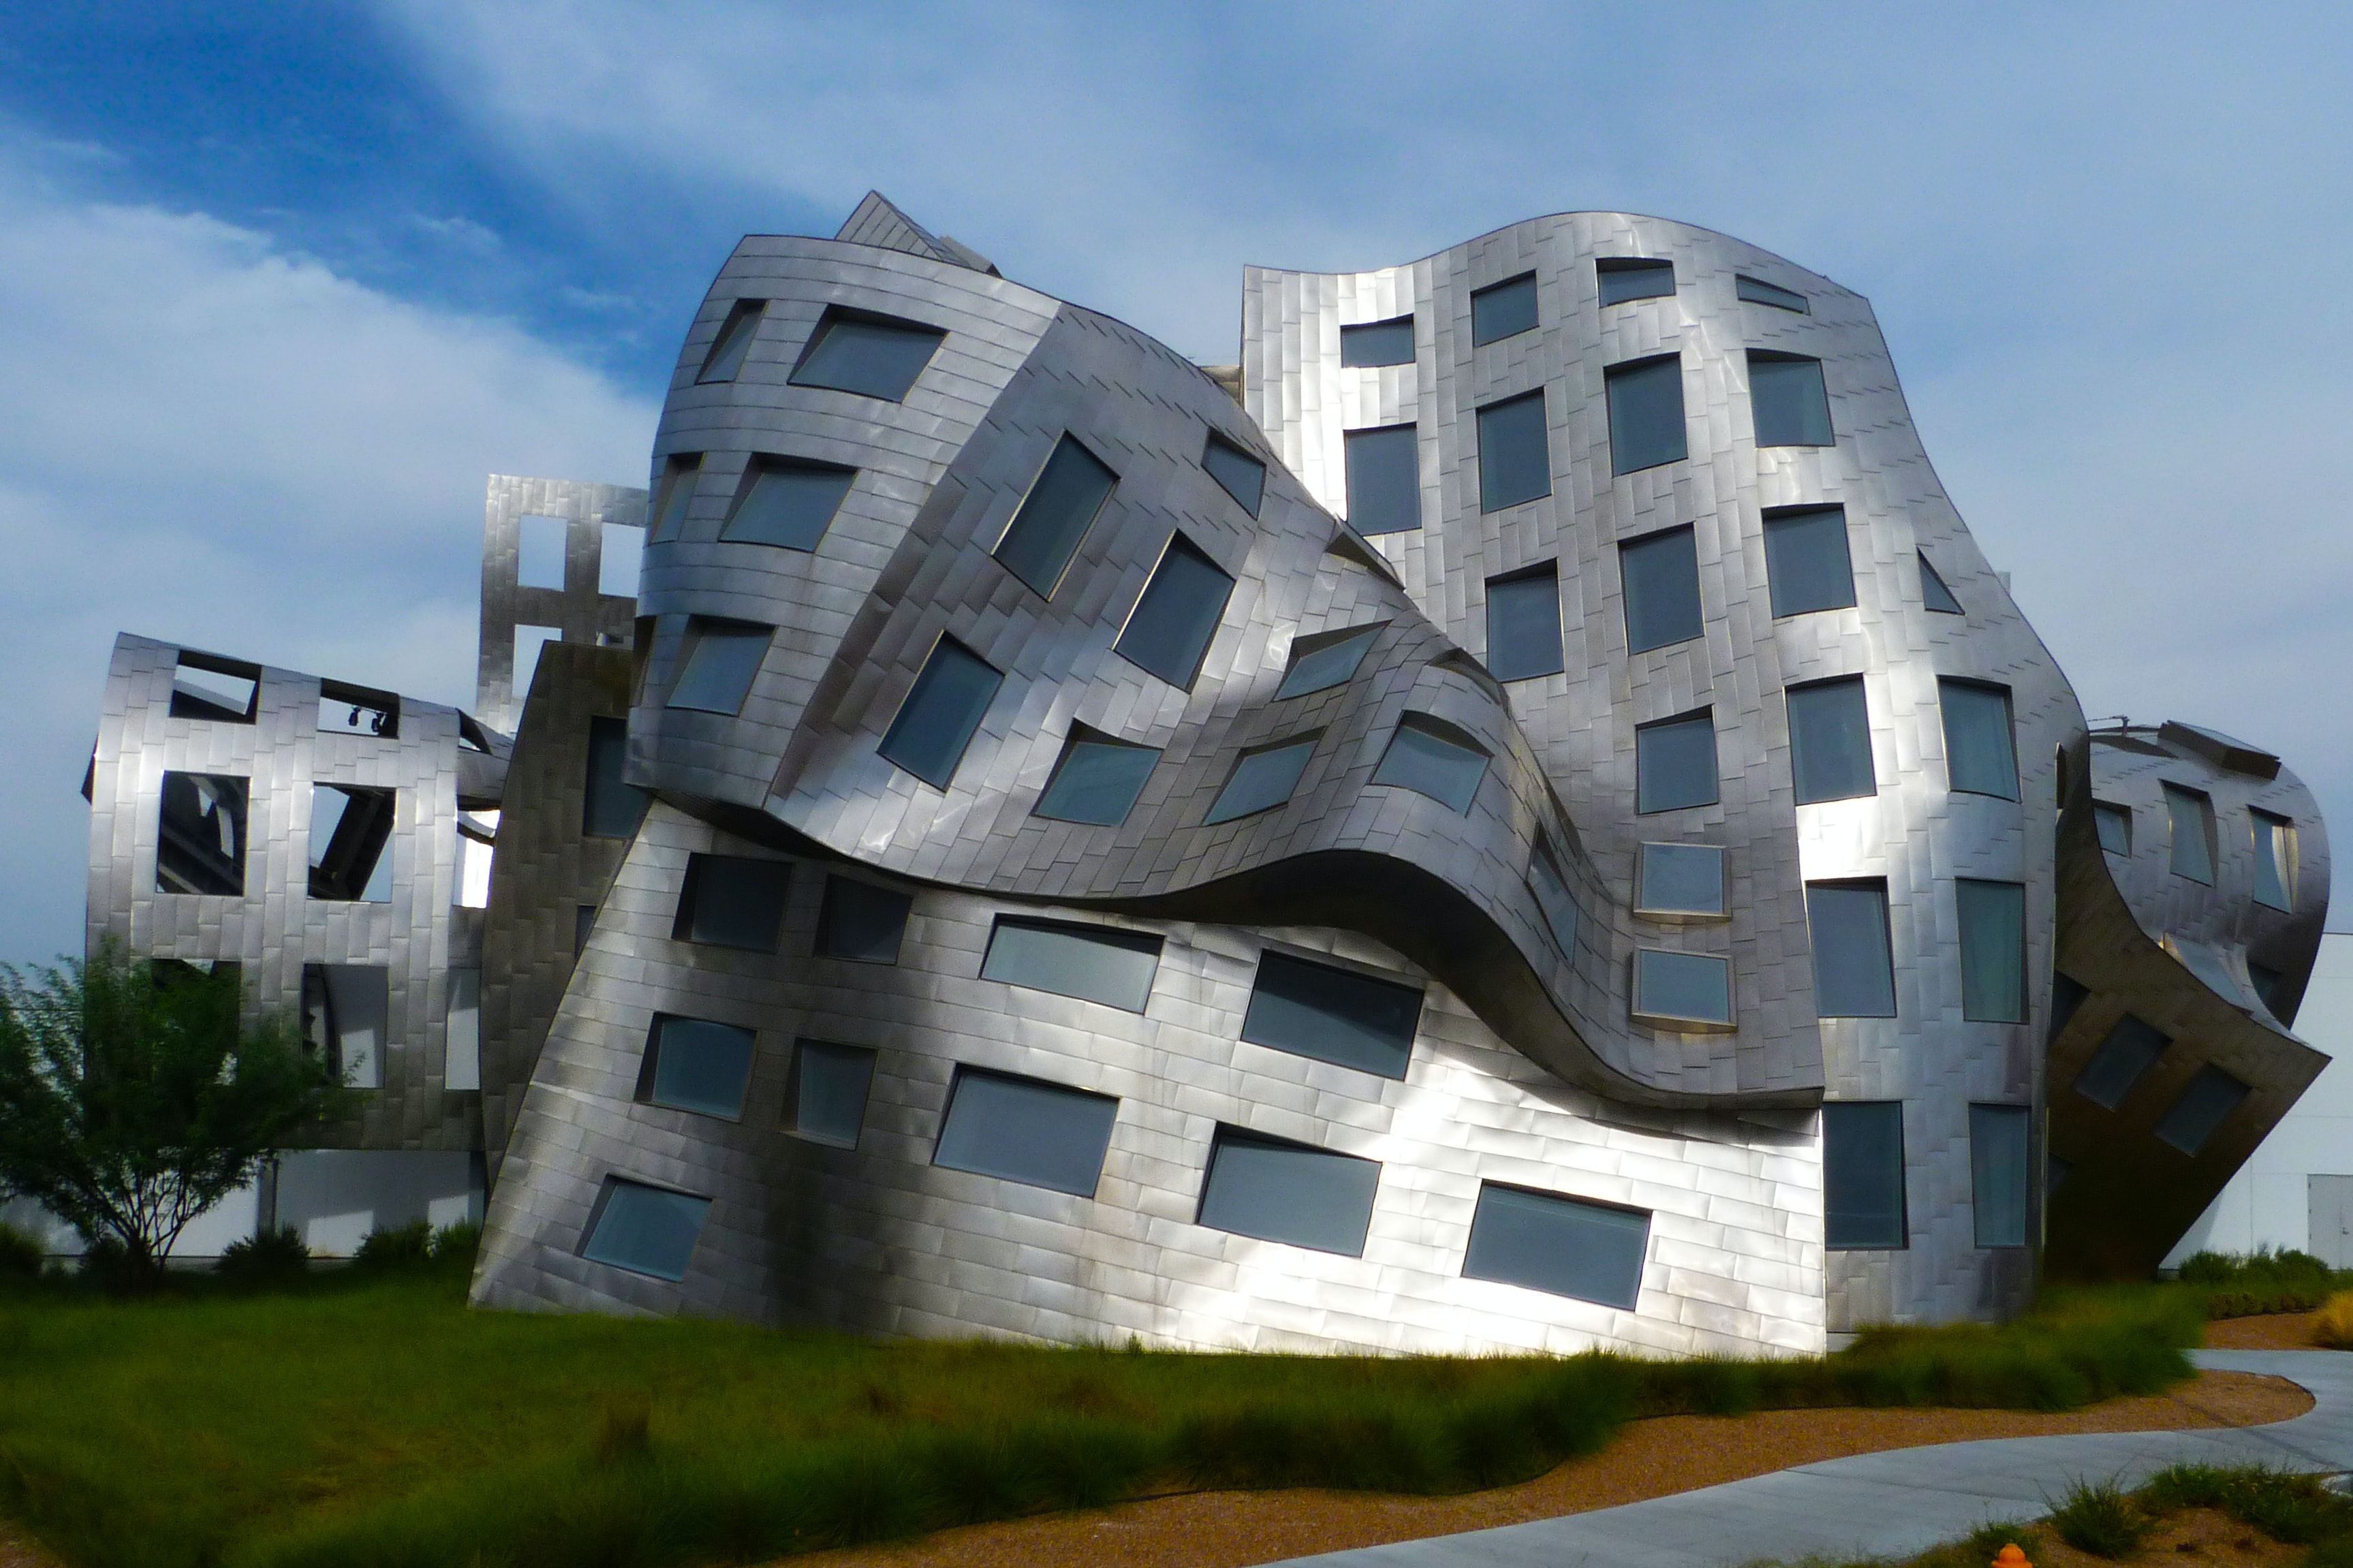 landscape photo of melted building